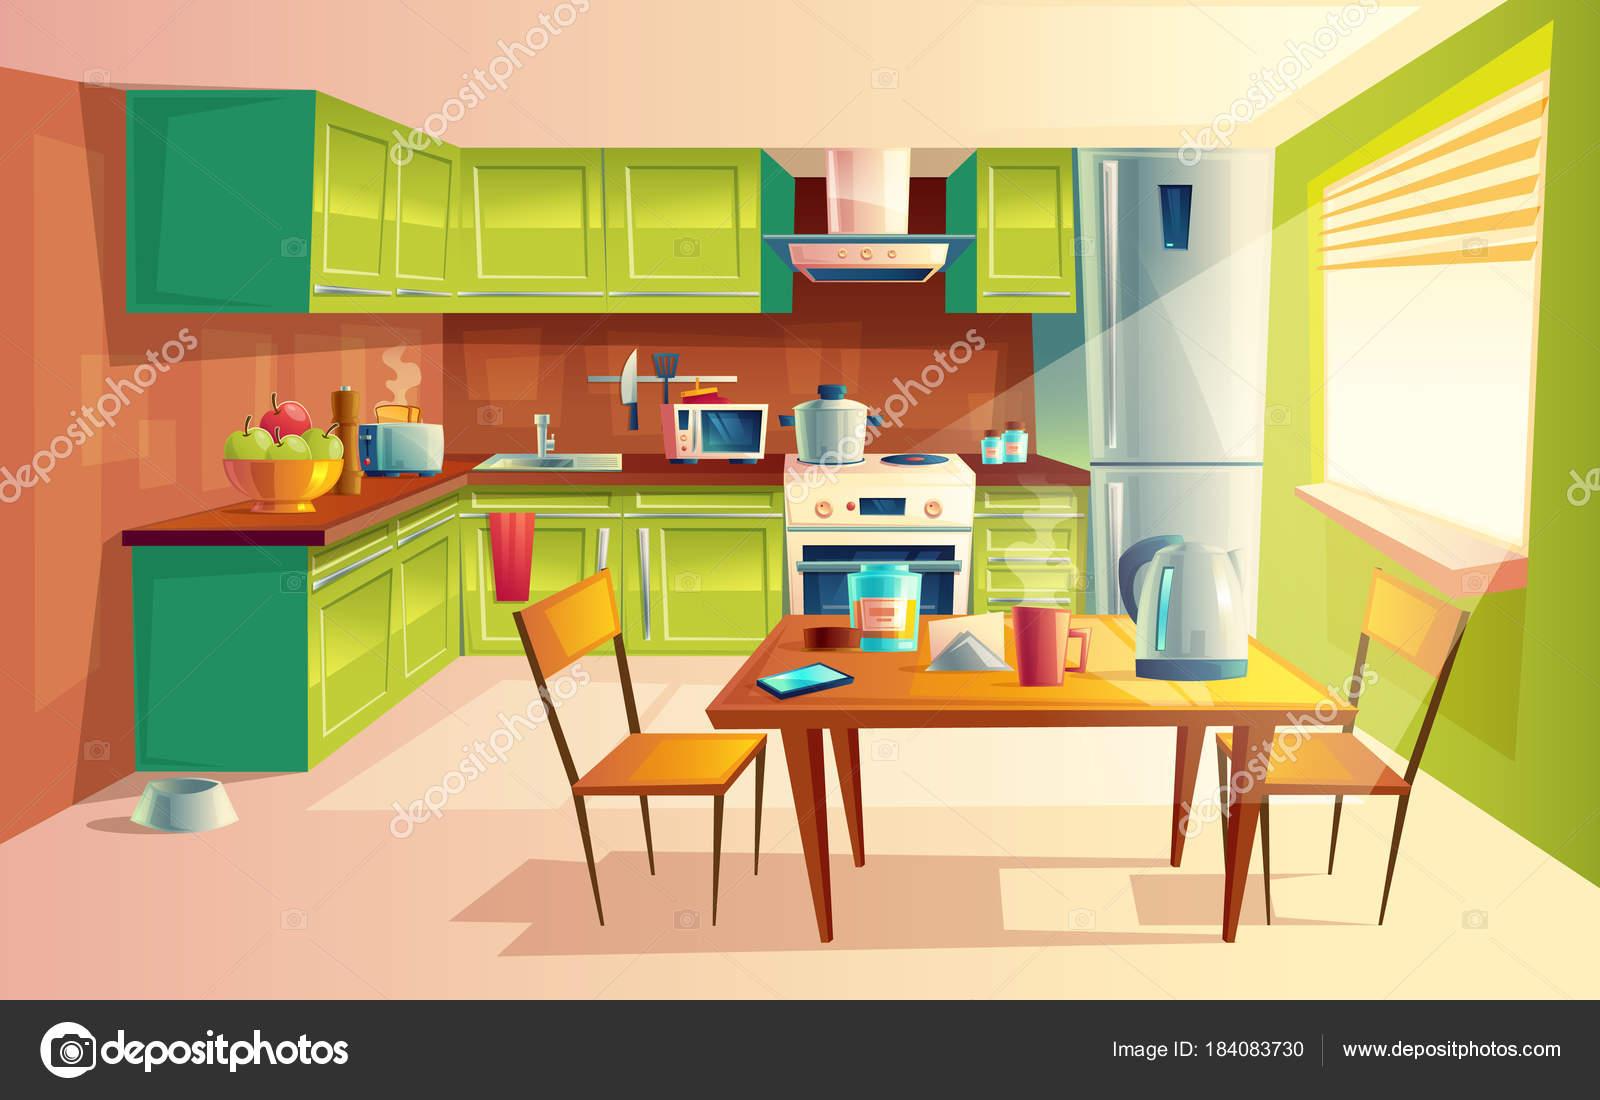 Imágenes: Cocinas Modernas Animadas